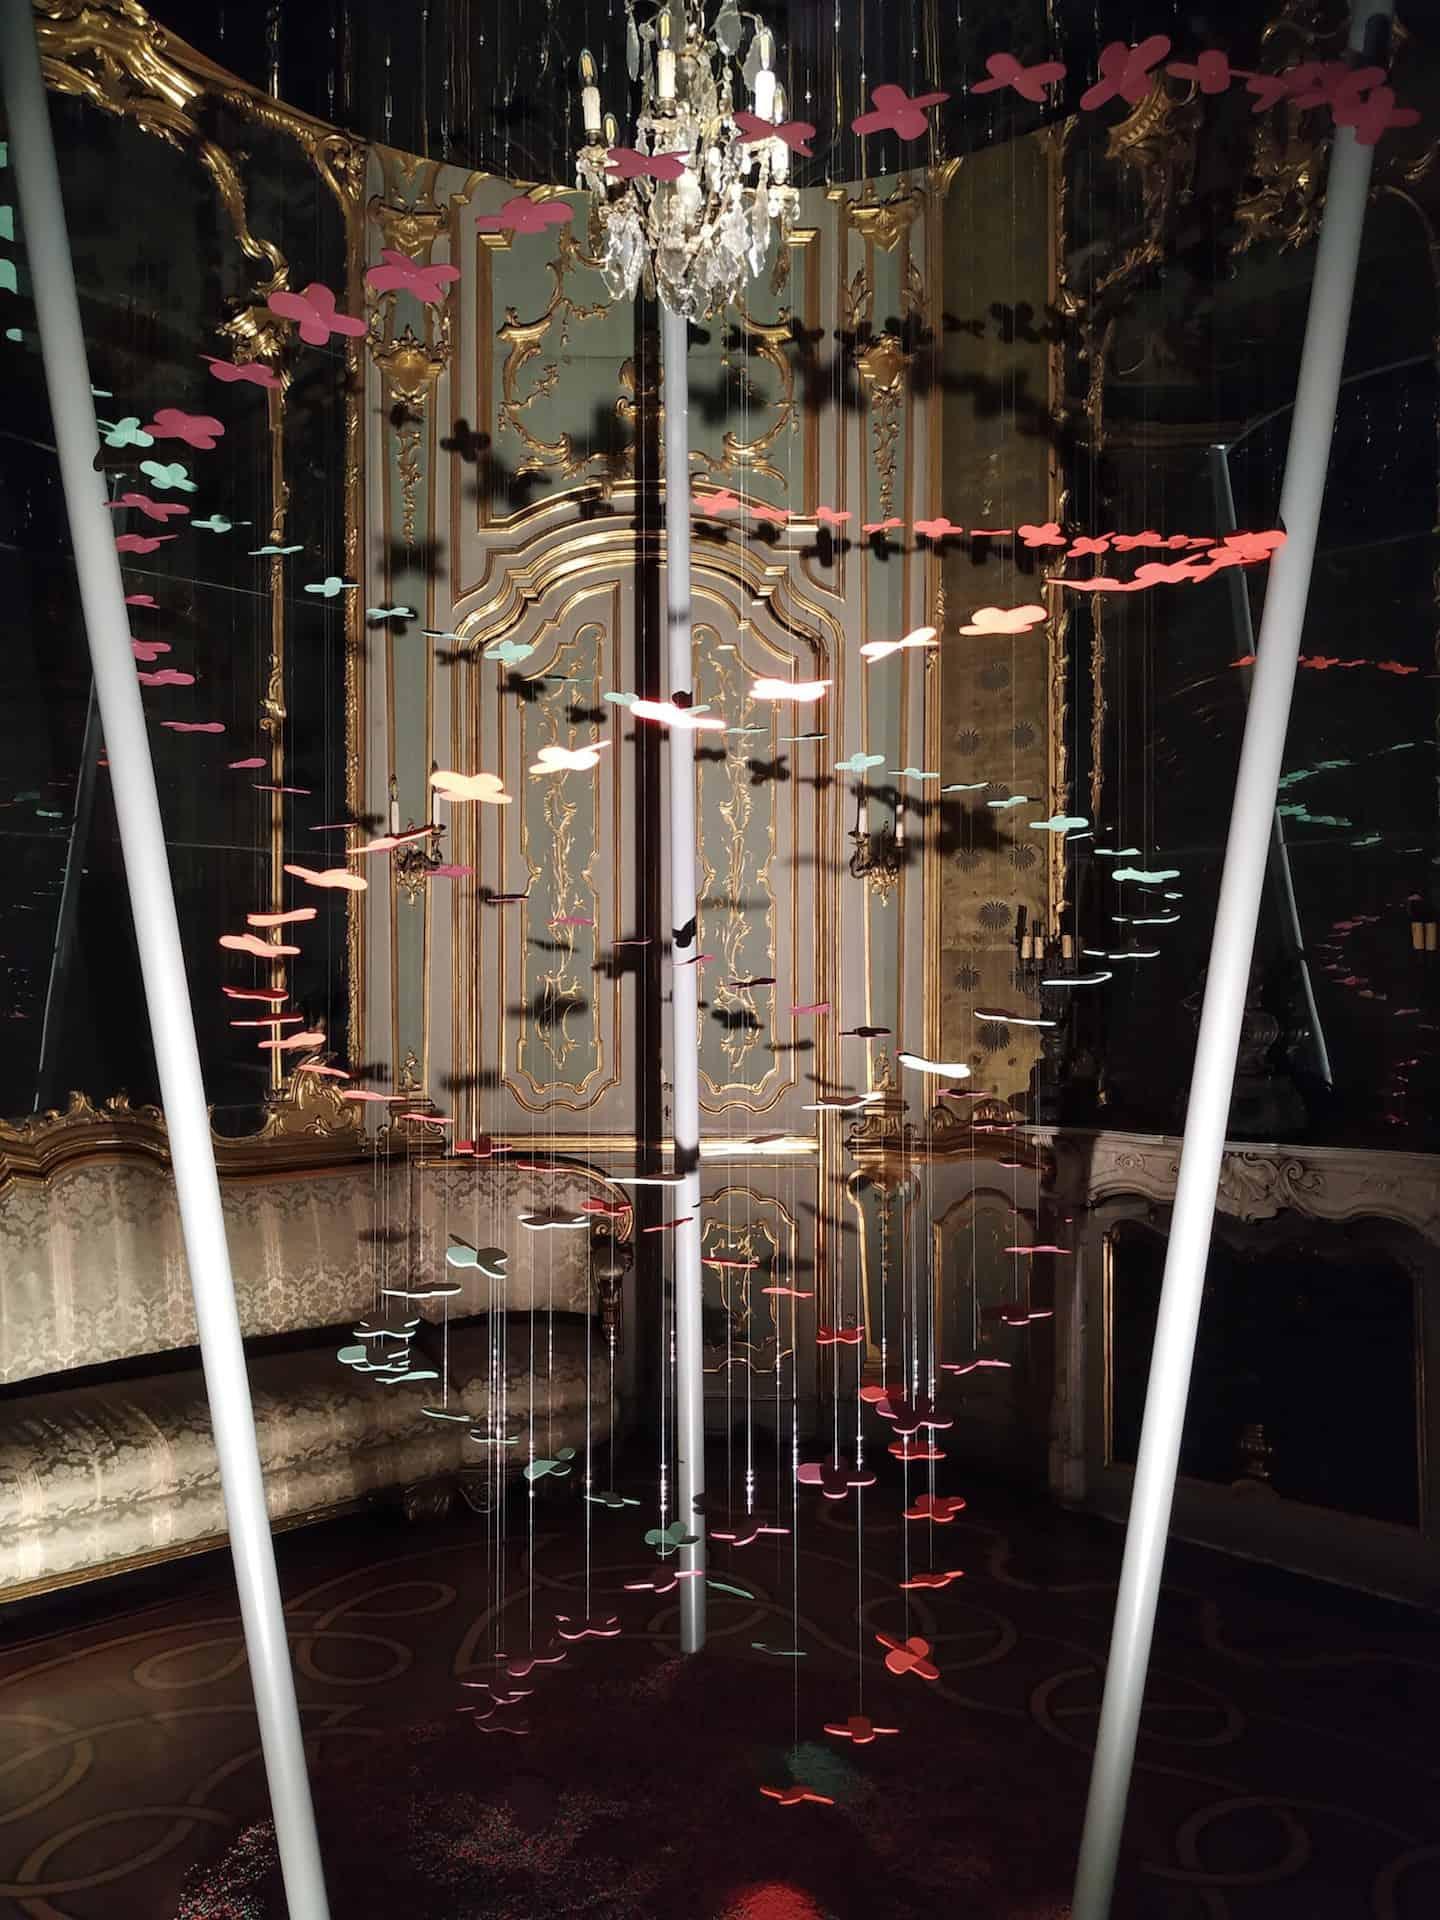 XL Extra light AXAP by Matteo Ragni Studios at Milan design week 2019